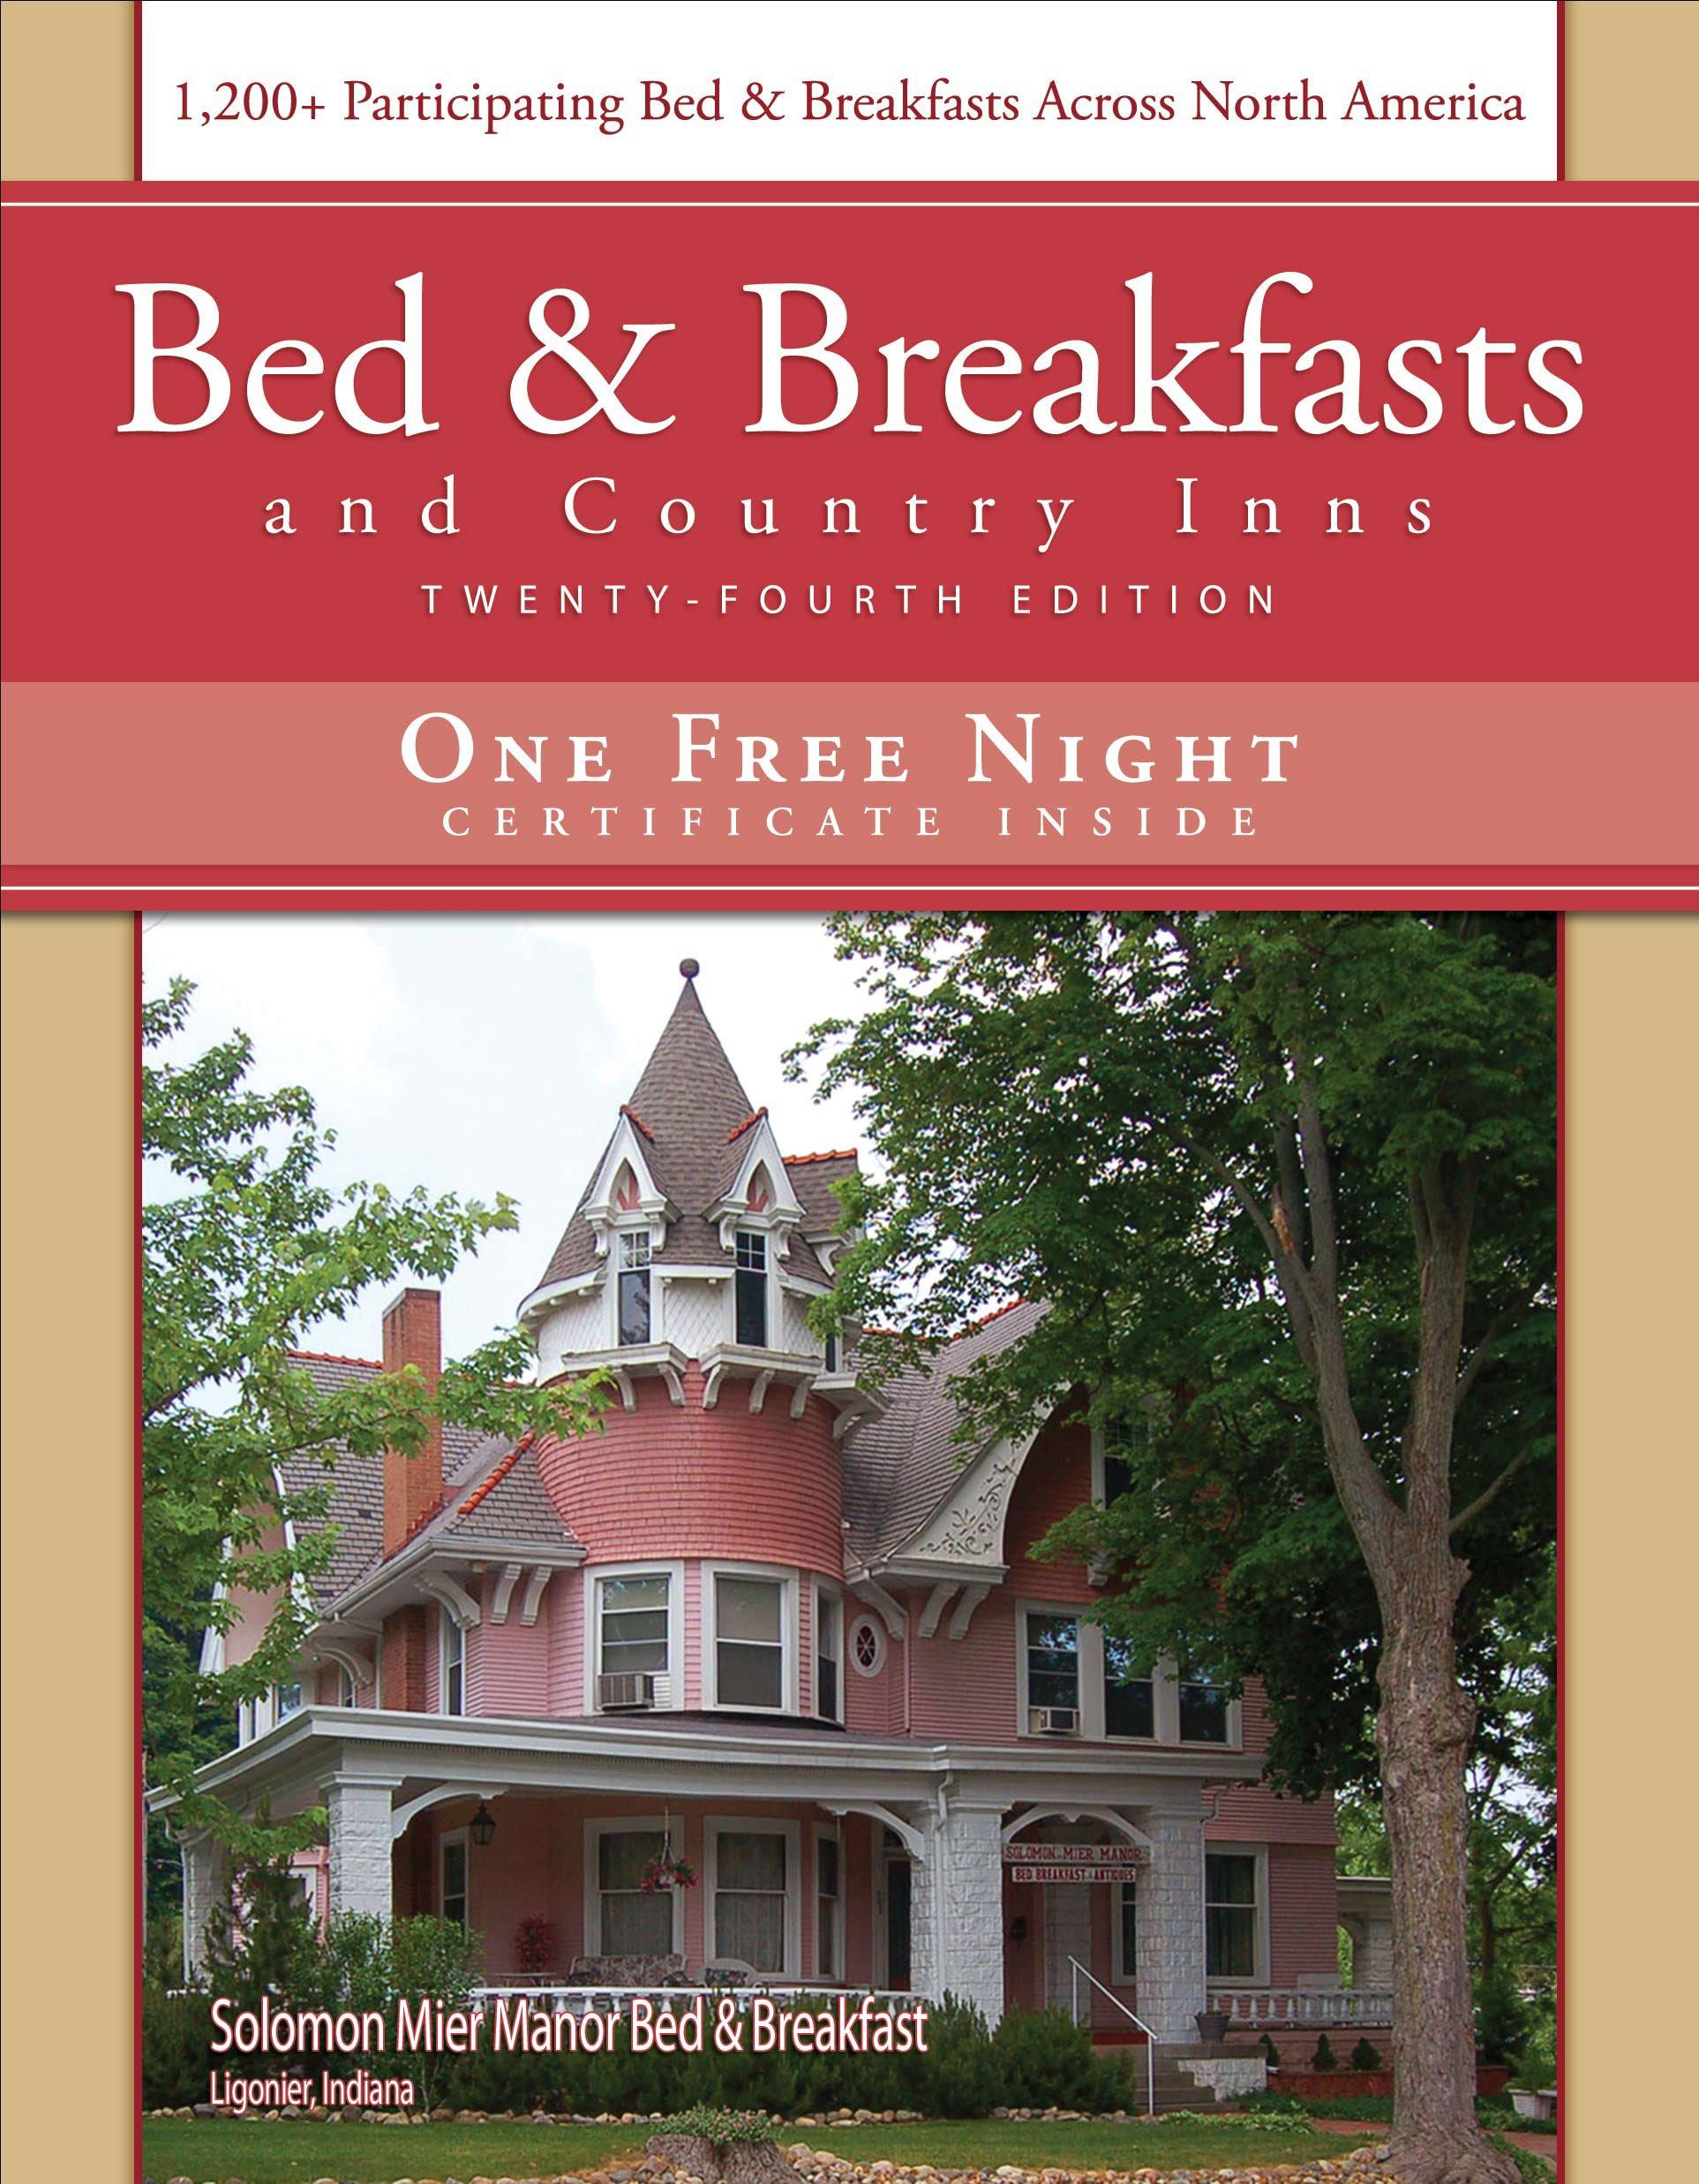 Bed U0026 Breakfast And Country Inns, 24 Edition (American Historic Inns: Bed  And Breakfasts And Country Inns): Deborah Edwards Sakach: 9781888050097: ...